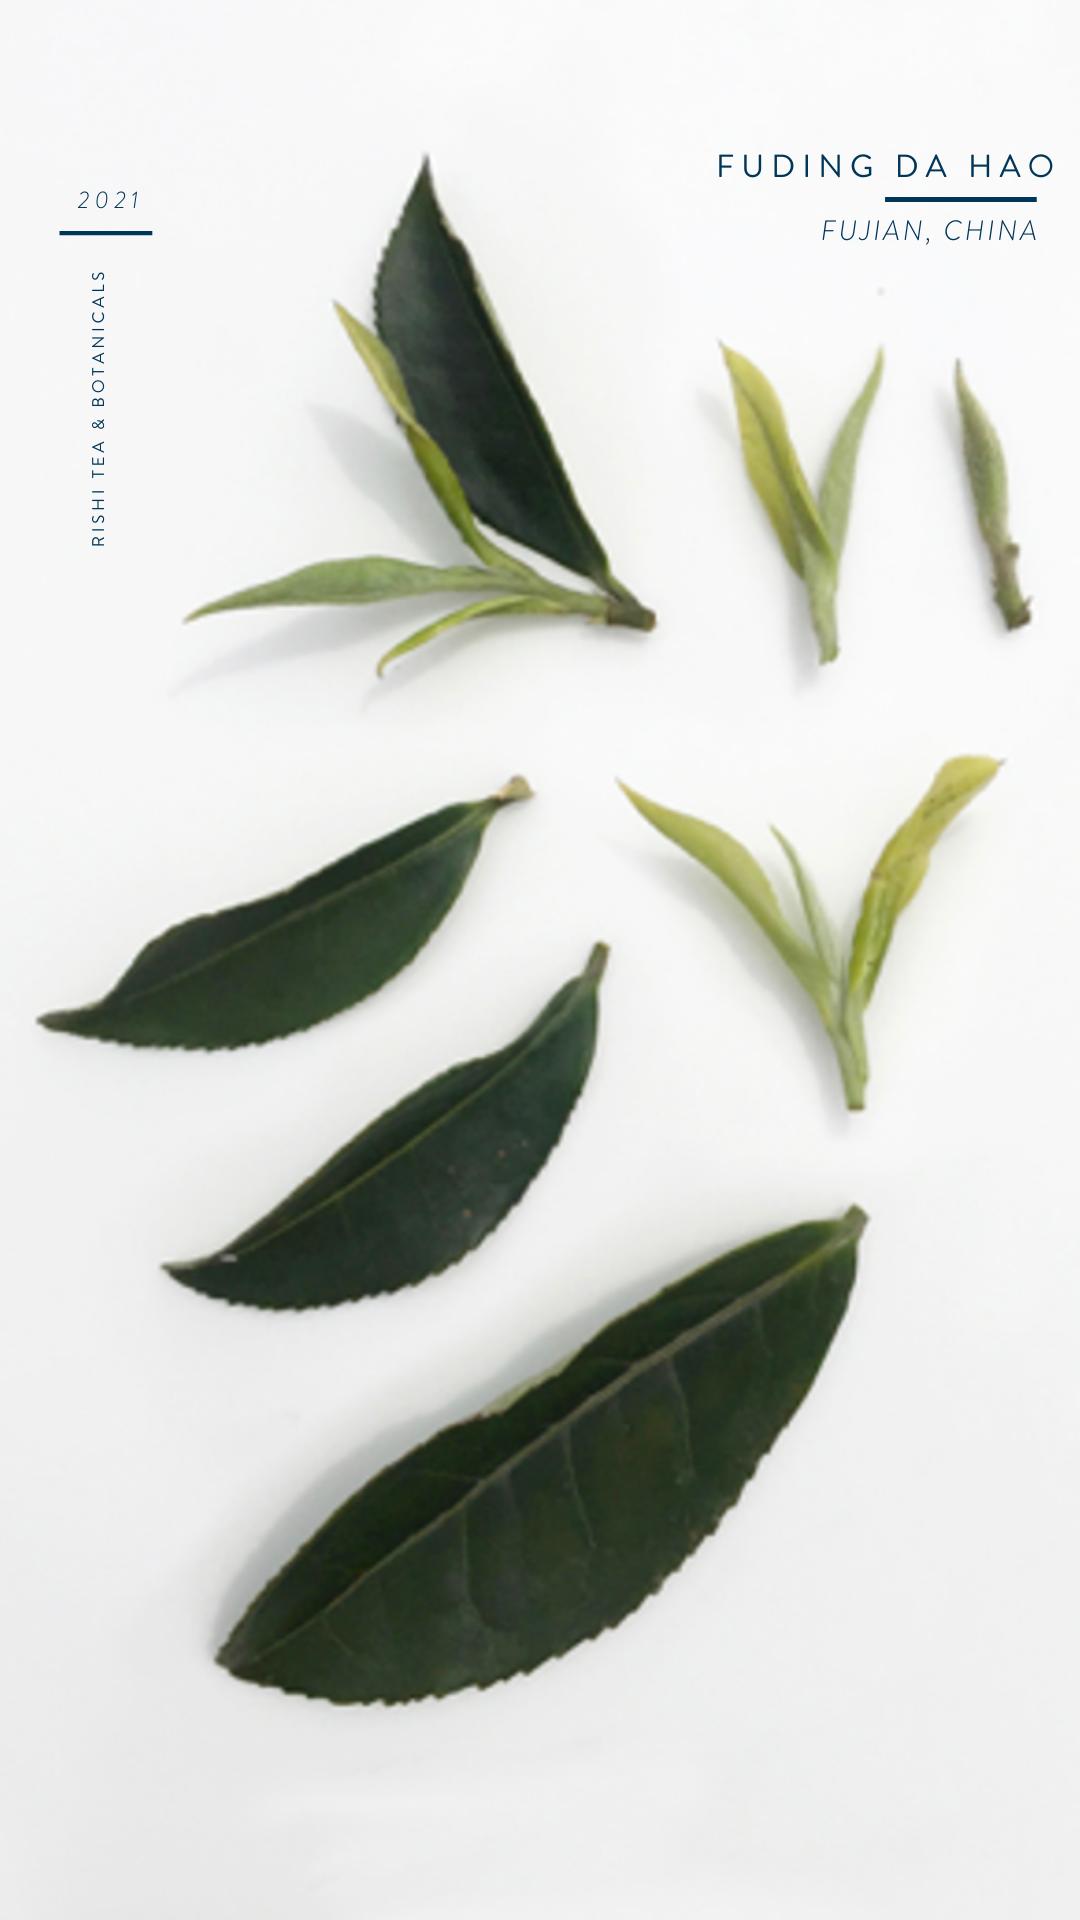 Fuding Da Hao Cultivar Tea Leaf